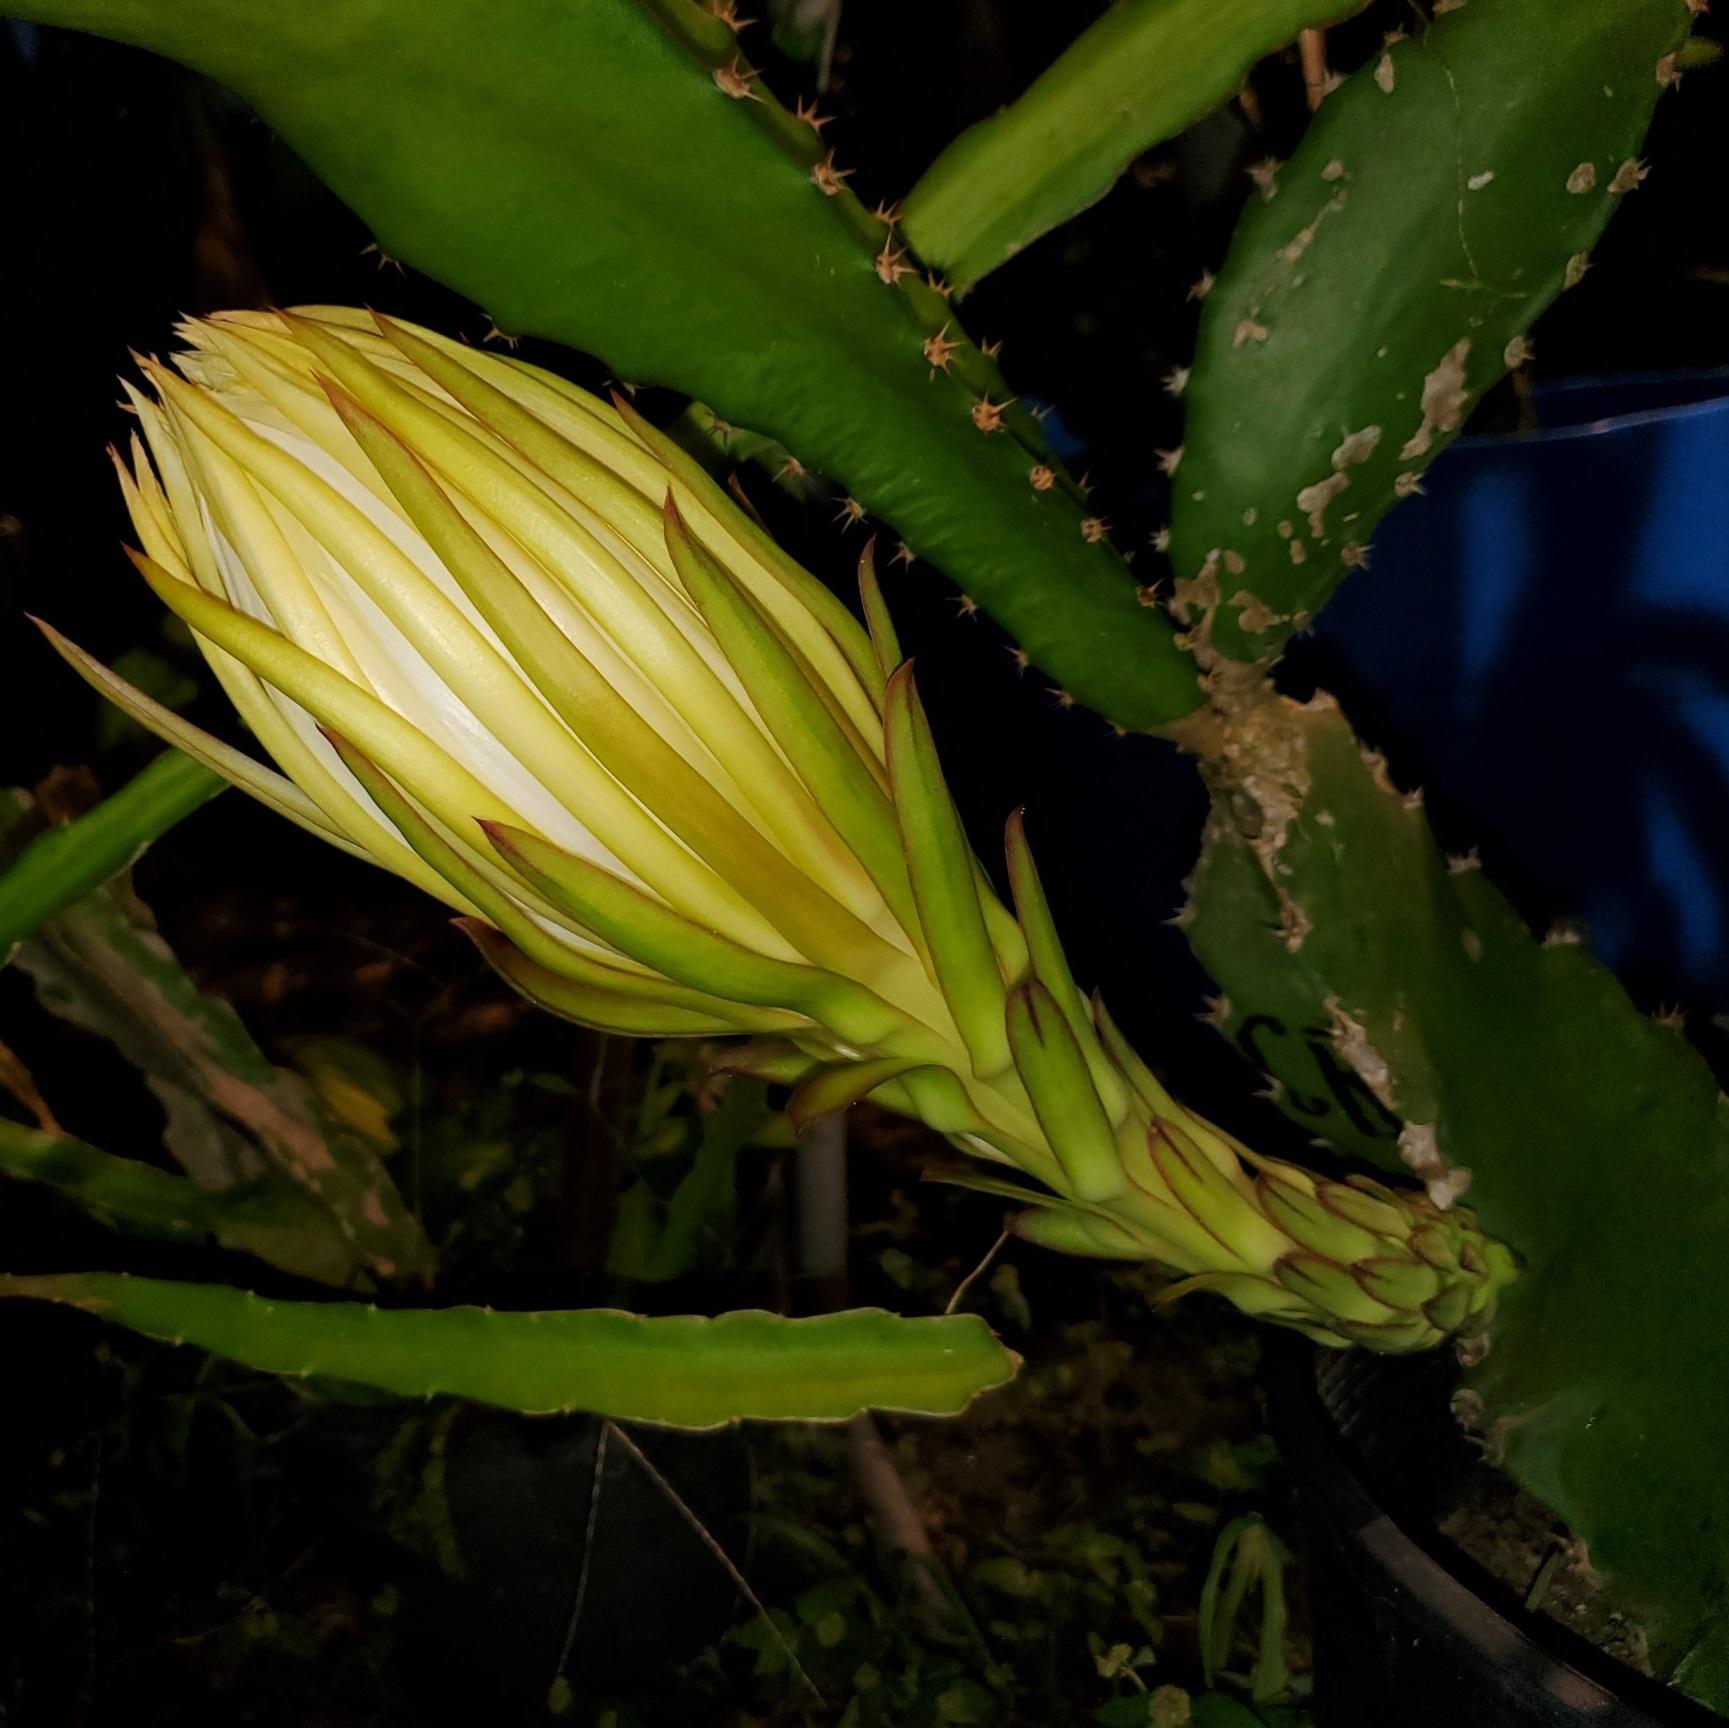 Costa Rican Sunset Dragon Fruit Flower bud